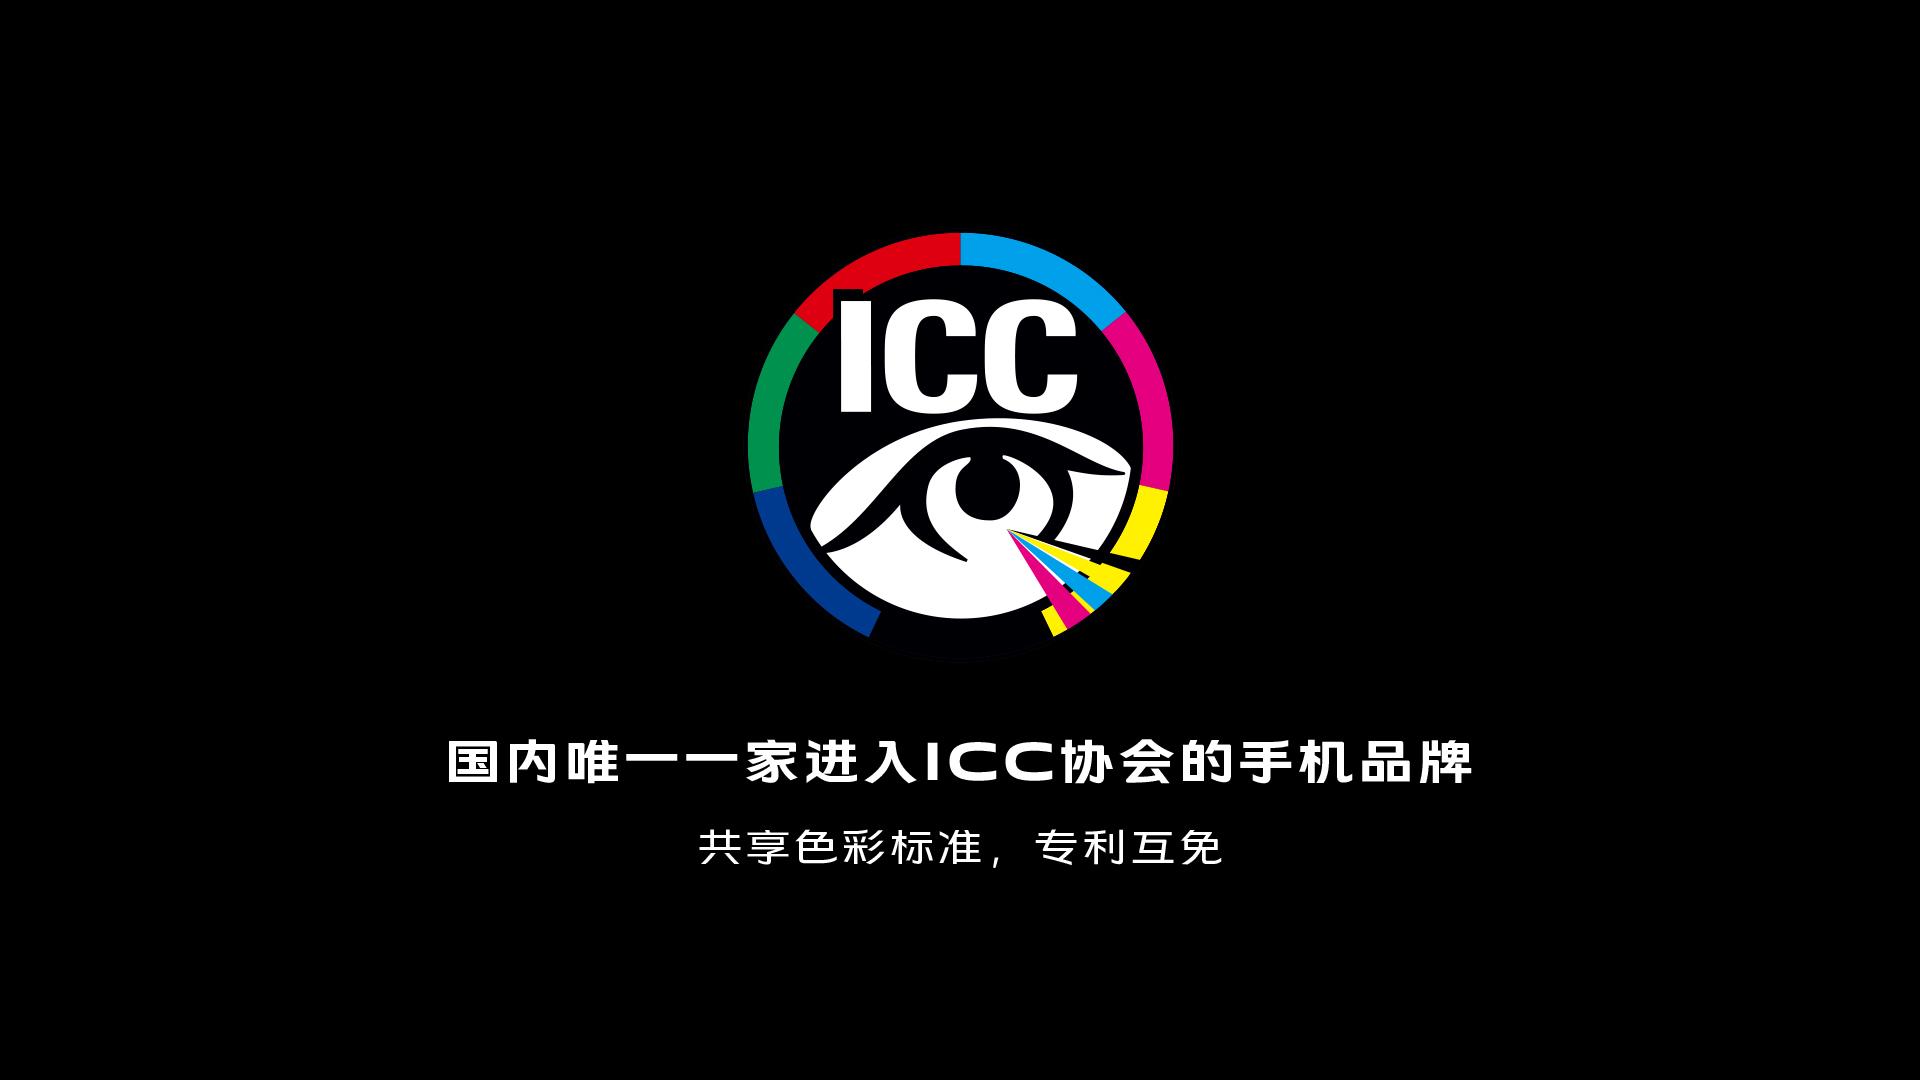 17-icc.jpg